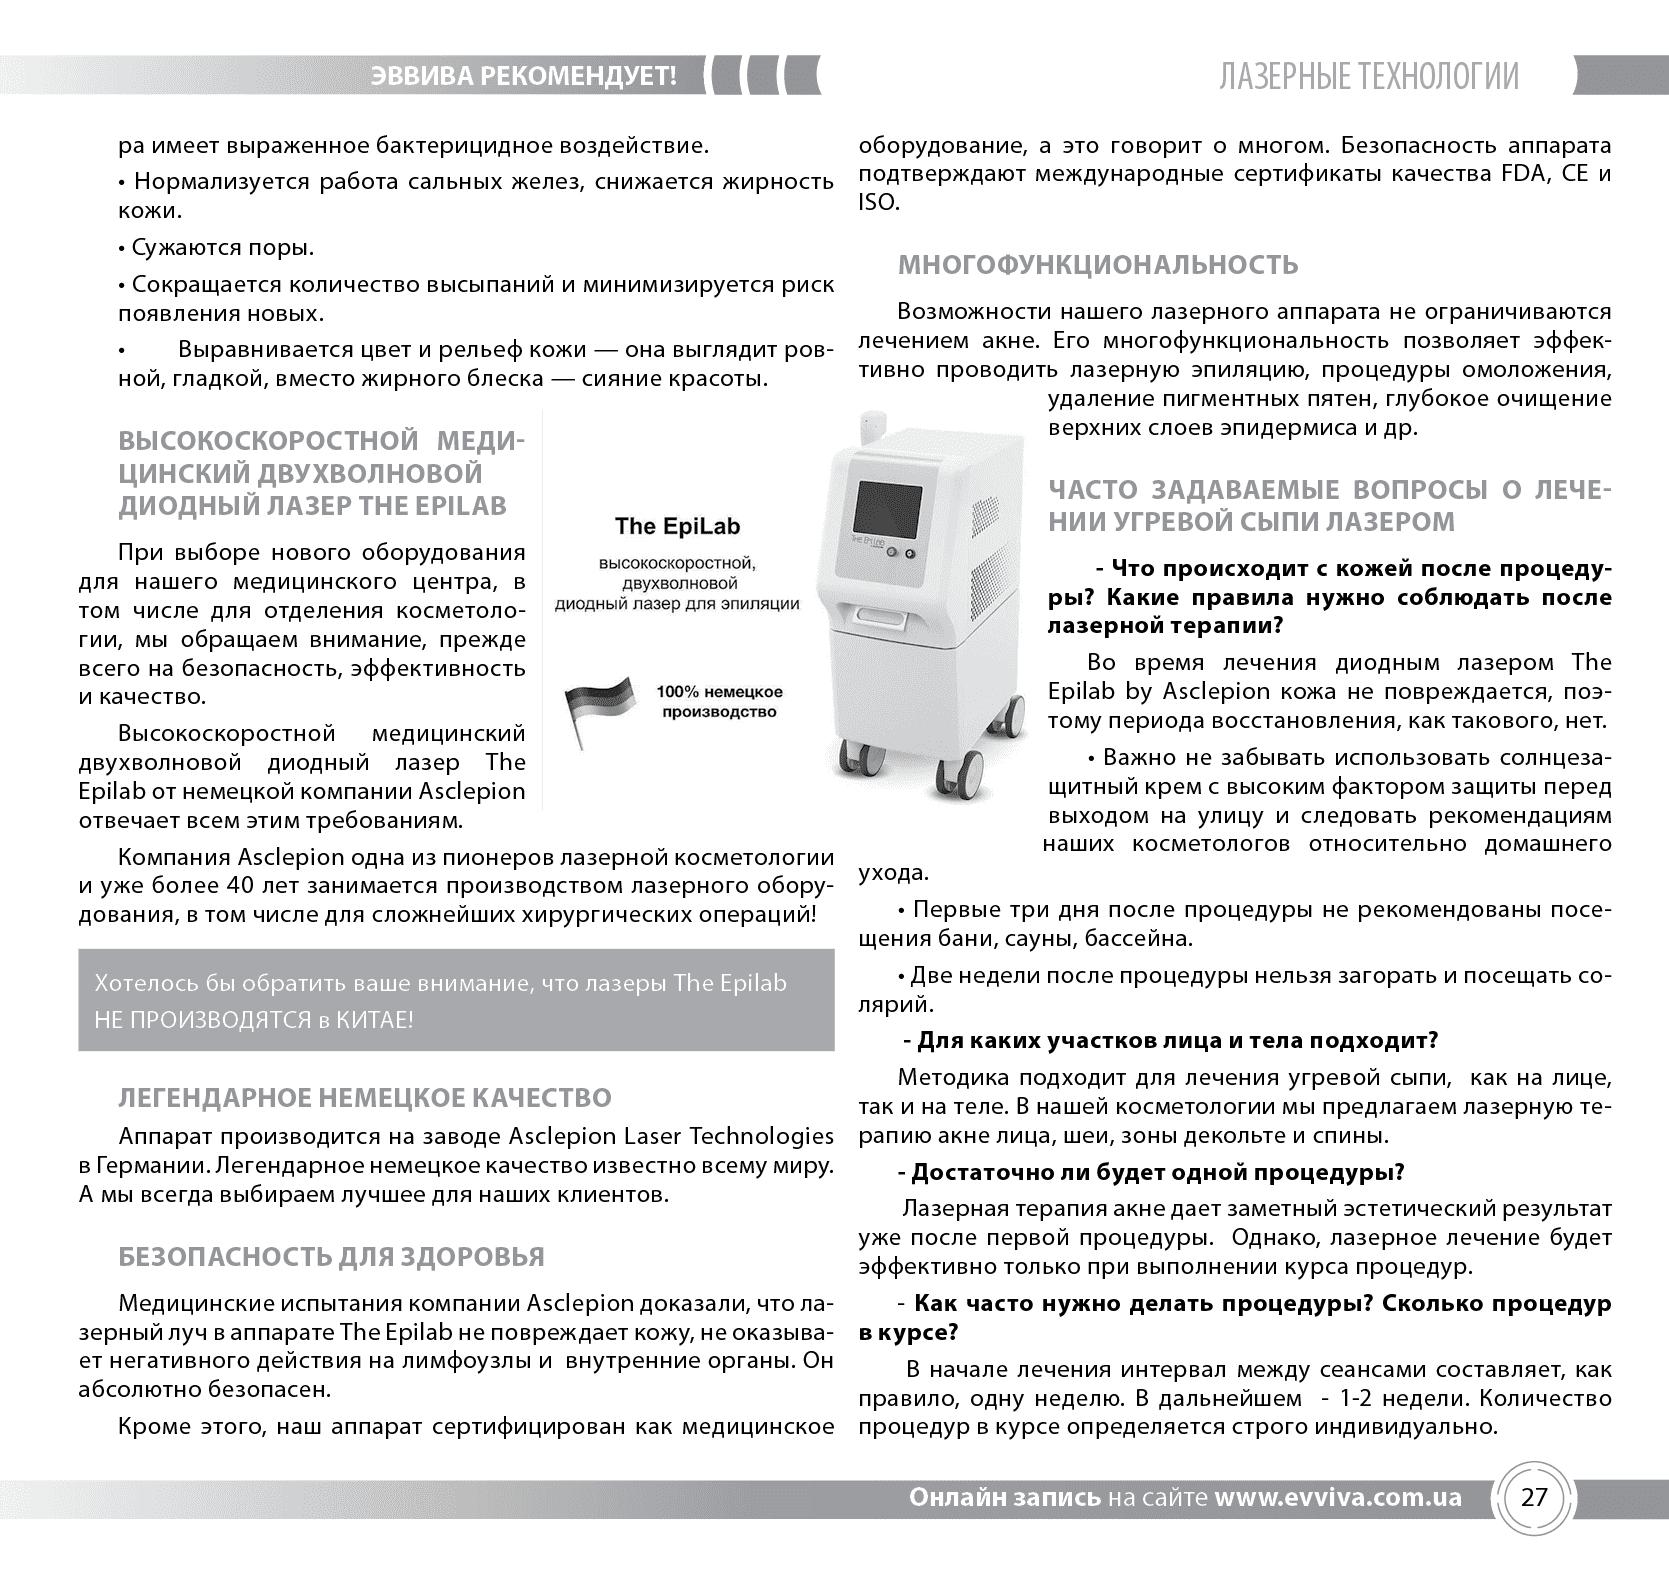 evviva-zhurnal-118-page27